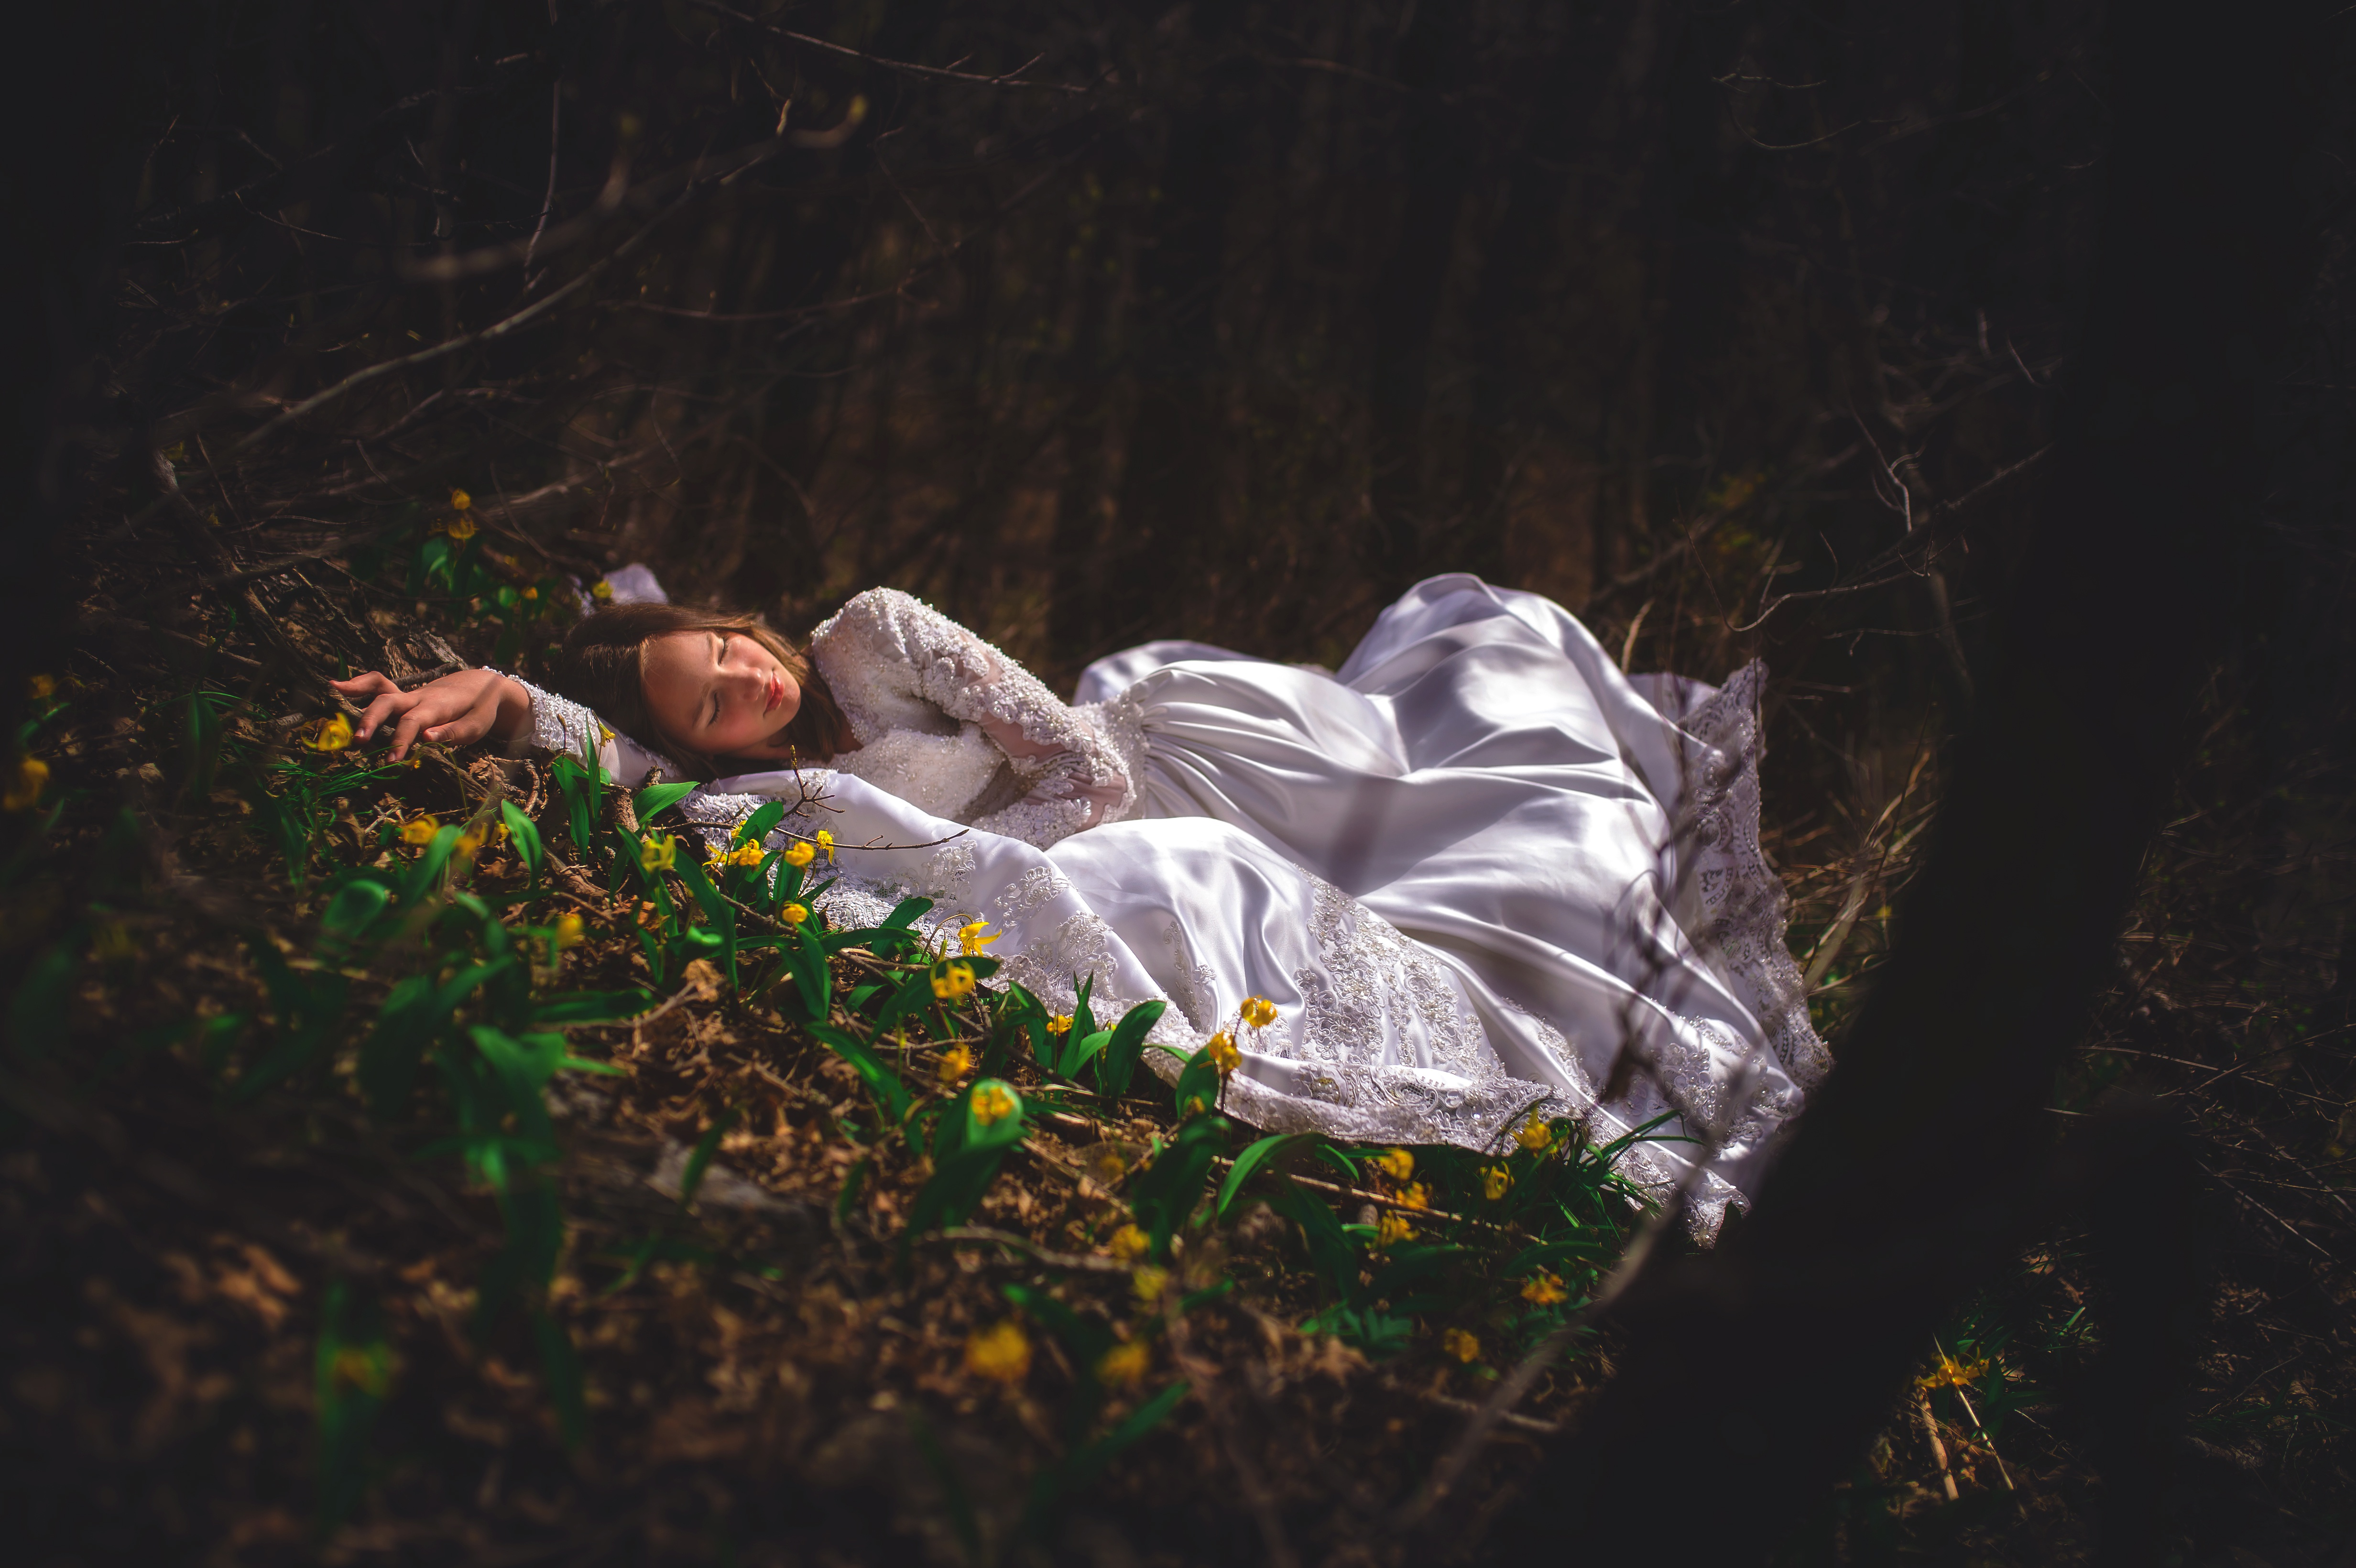 также фотосессия со спящим цвет мочи